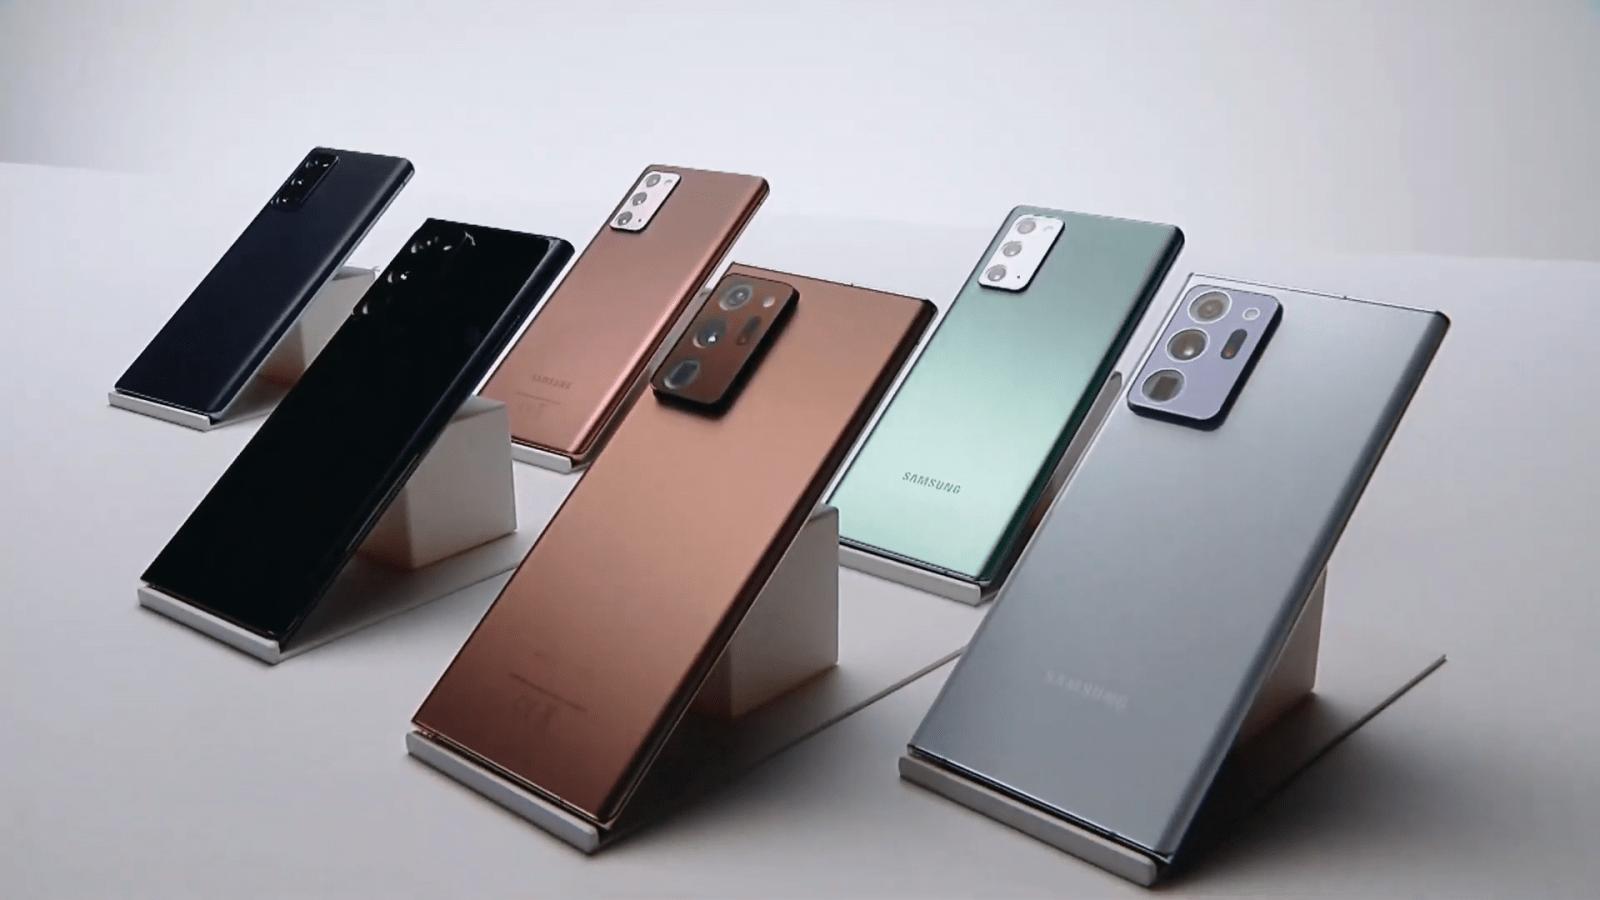 Samsung Galaxy Note 20 Ultra на базе Snapdragon фотографирует хуже, чем версия на Exynos